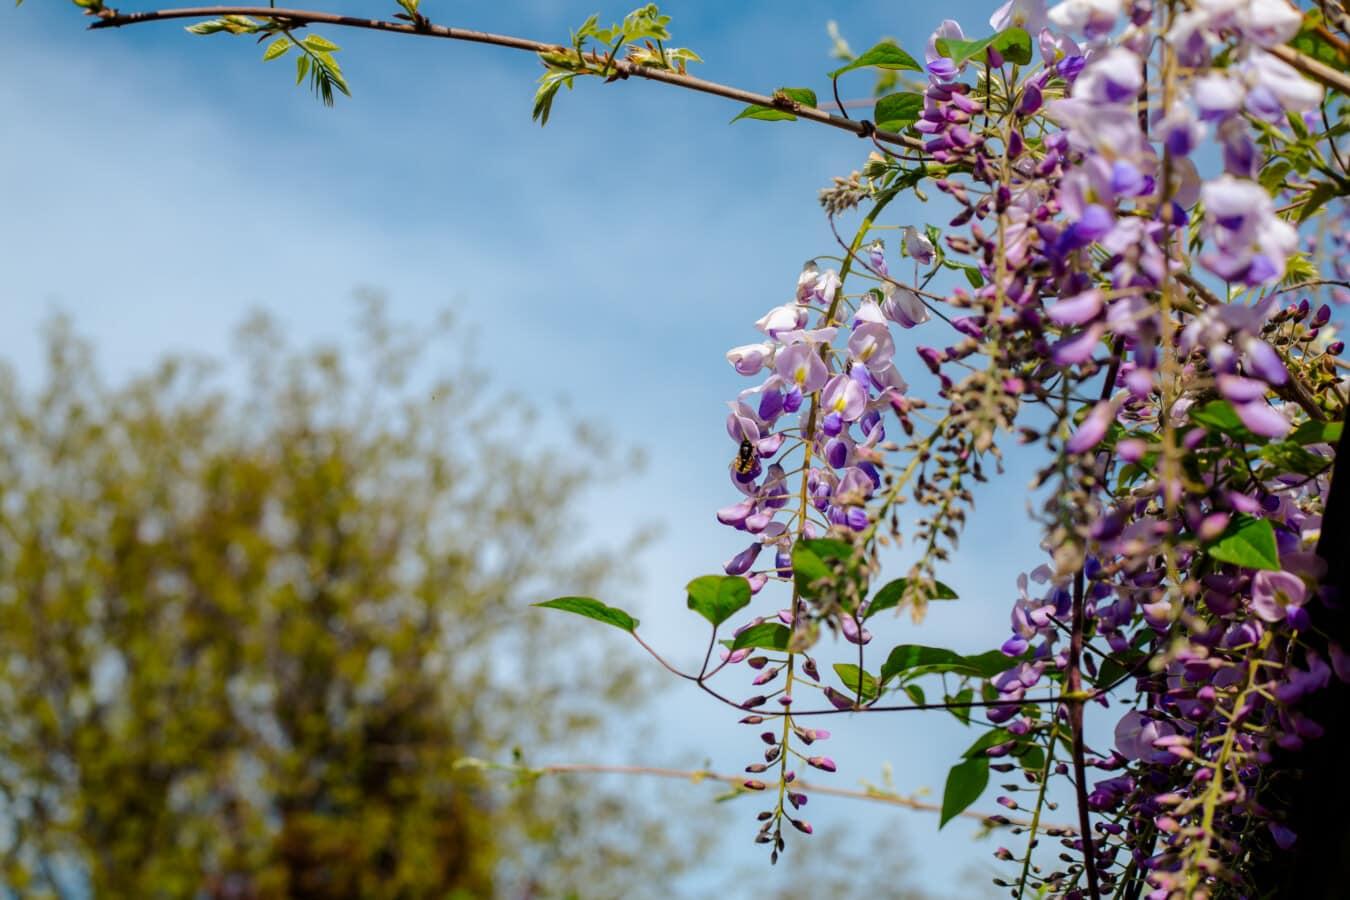 Akazie, Geäst, Blüte, lila, Blume, Natur, Anlage, Blatt, Ast, Struktur